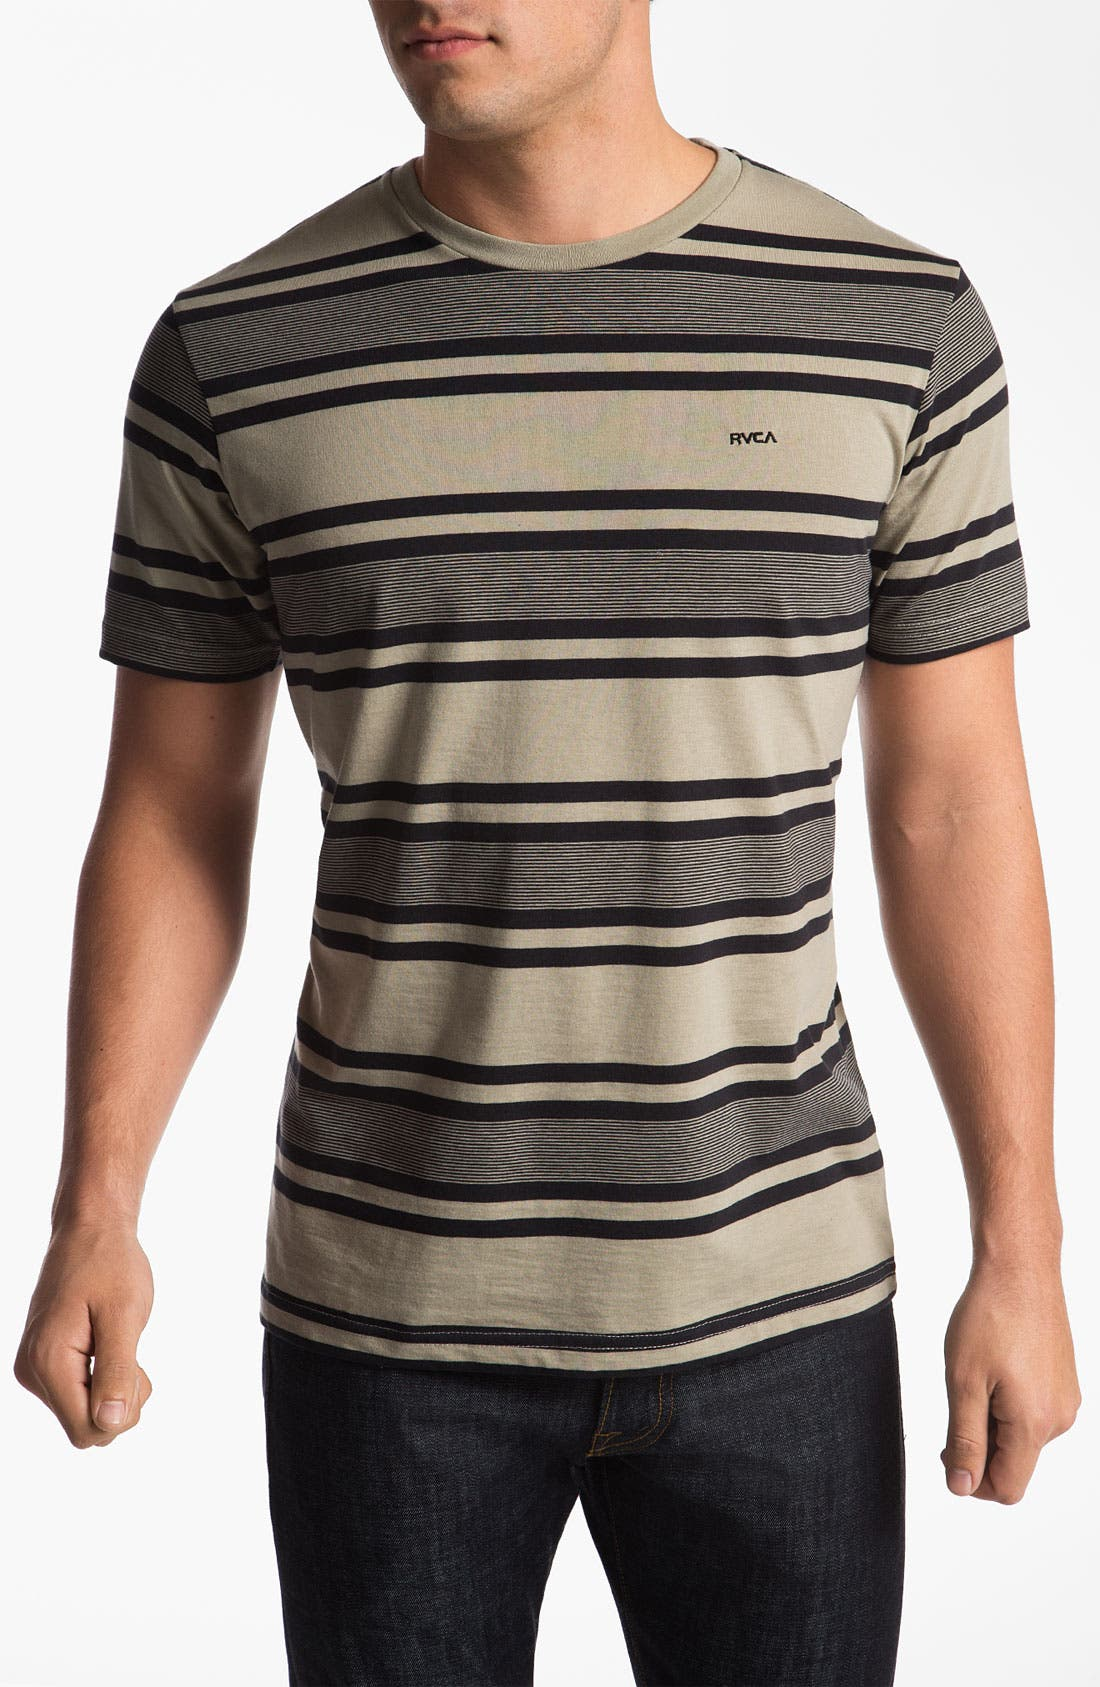 Alternate Image 1 Selected - RVCA 'SOS' Stripe Crewneck T-Shirt